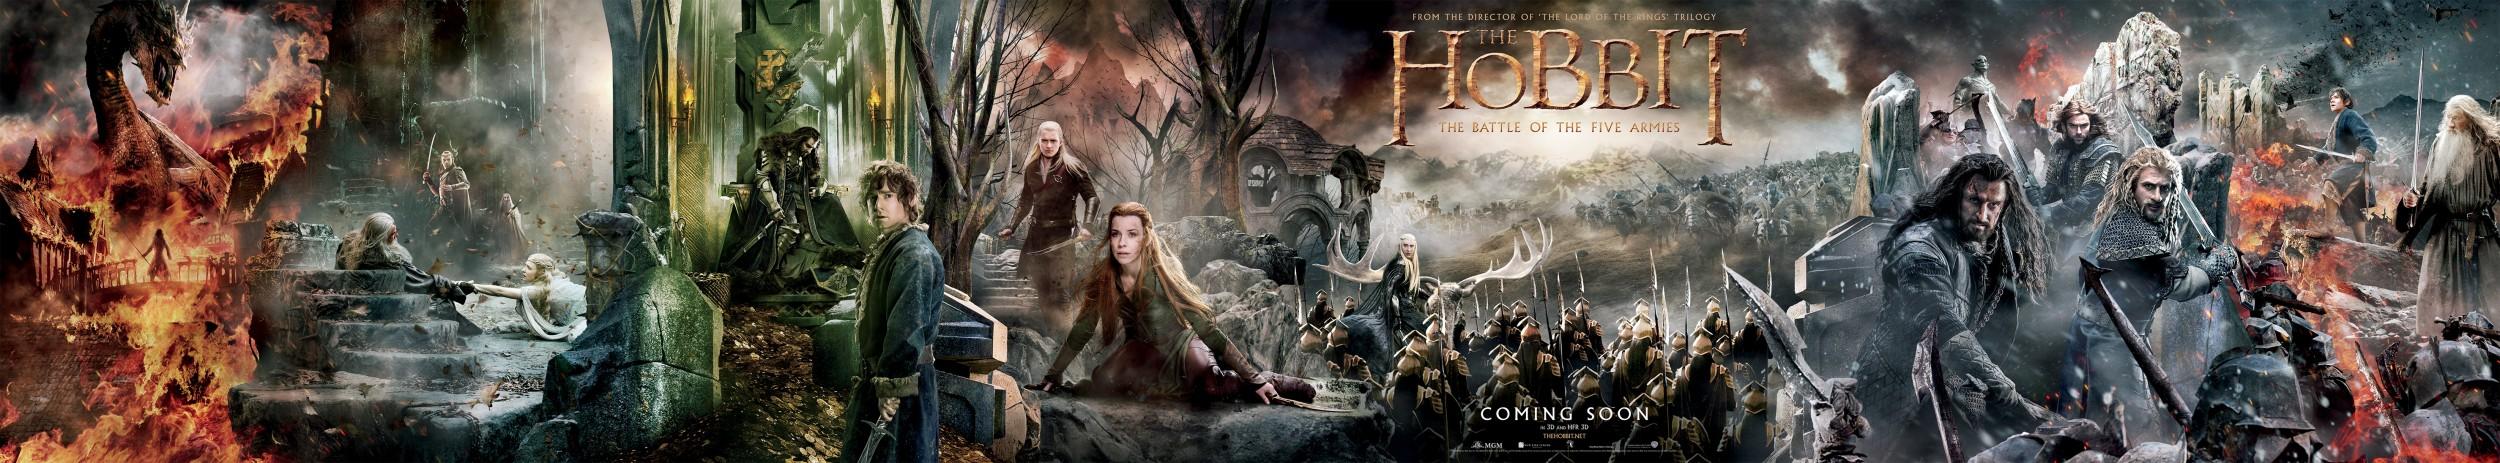 Hobbit_BOTFA.jpg